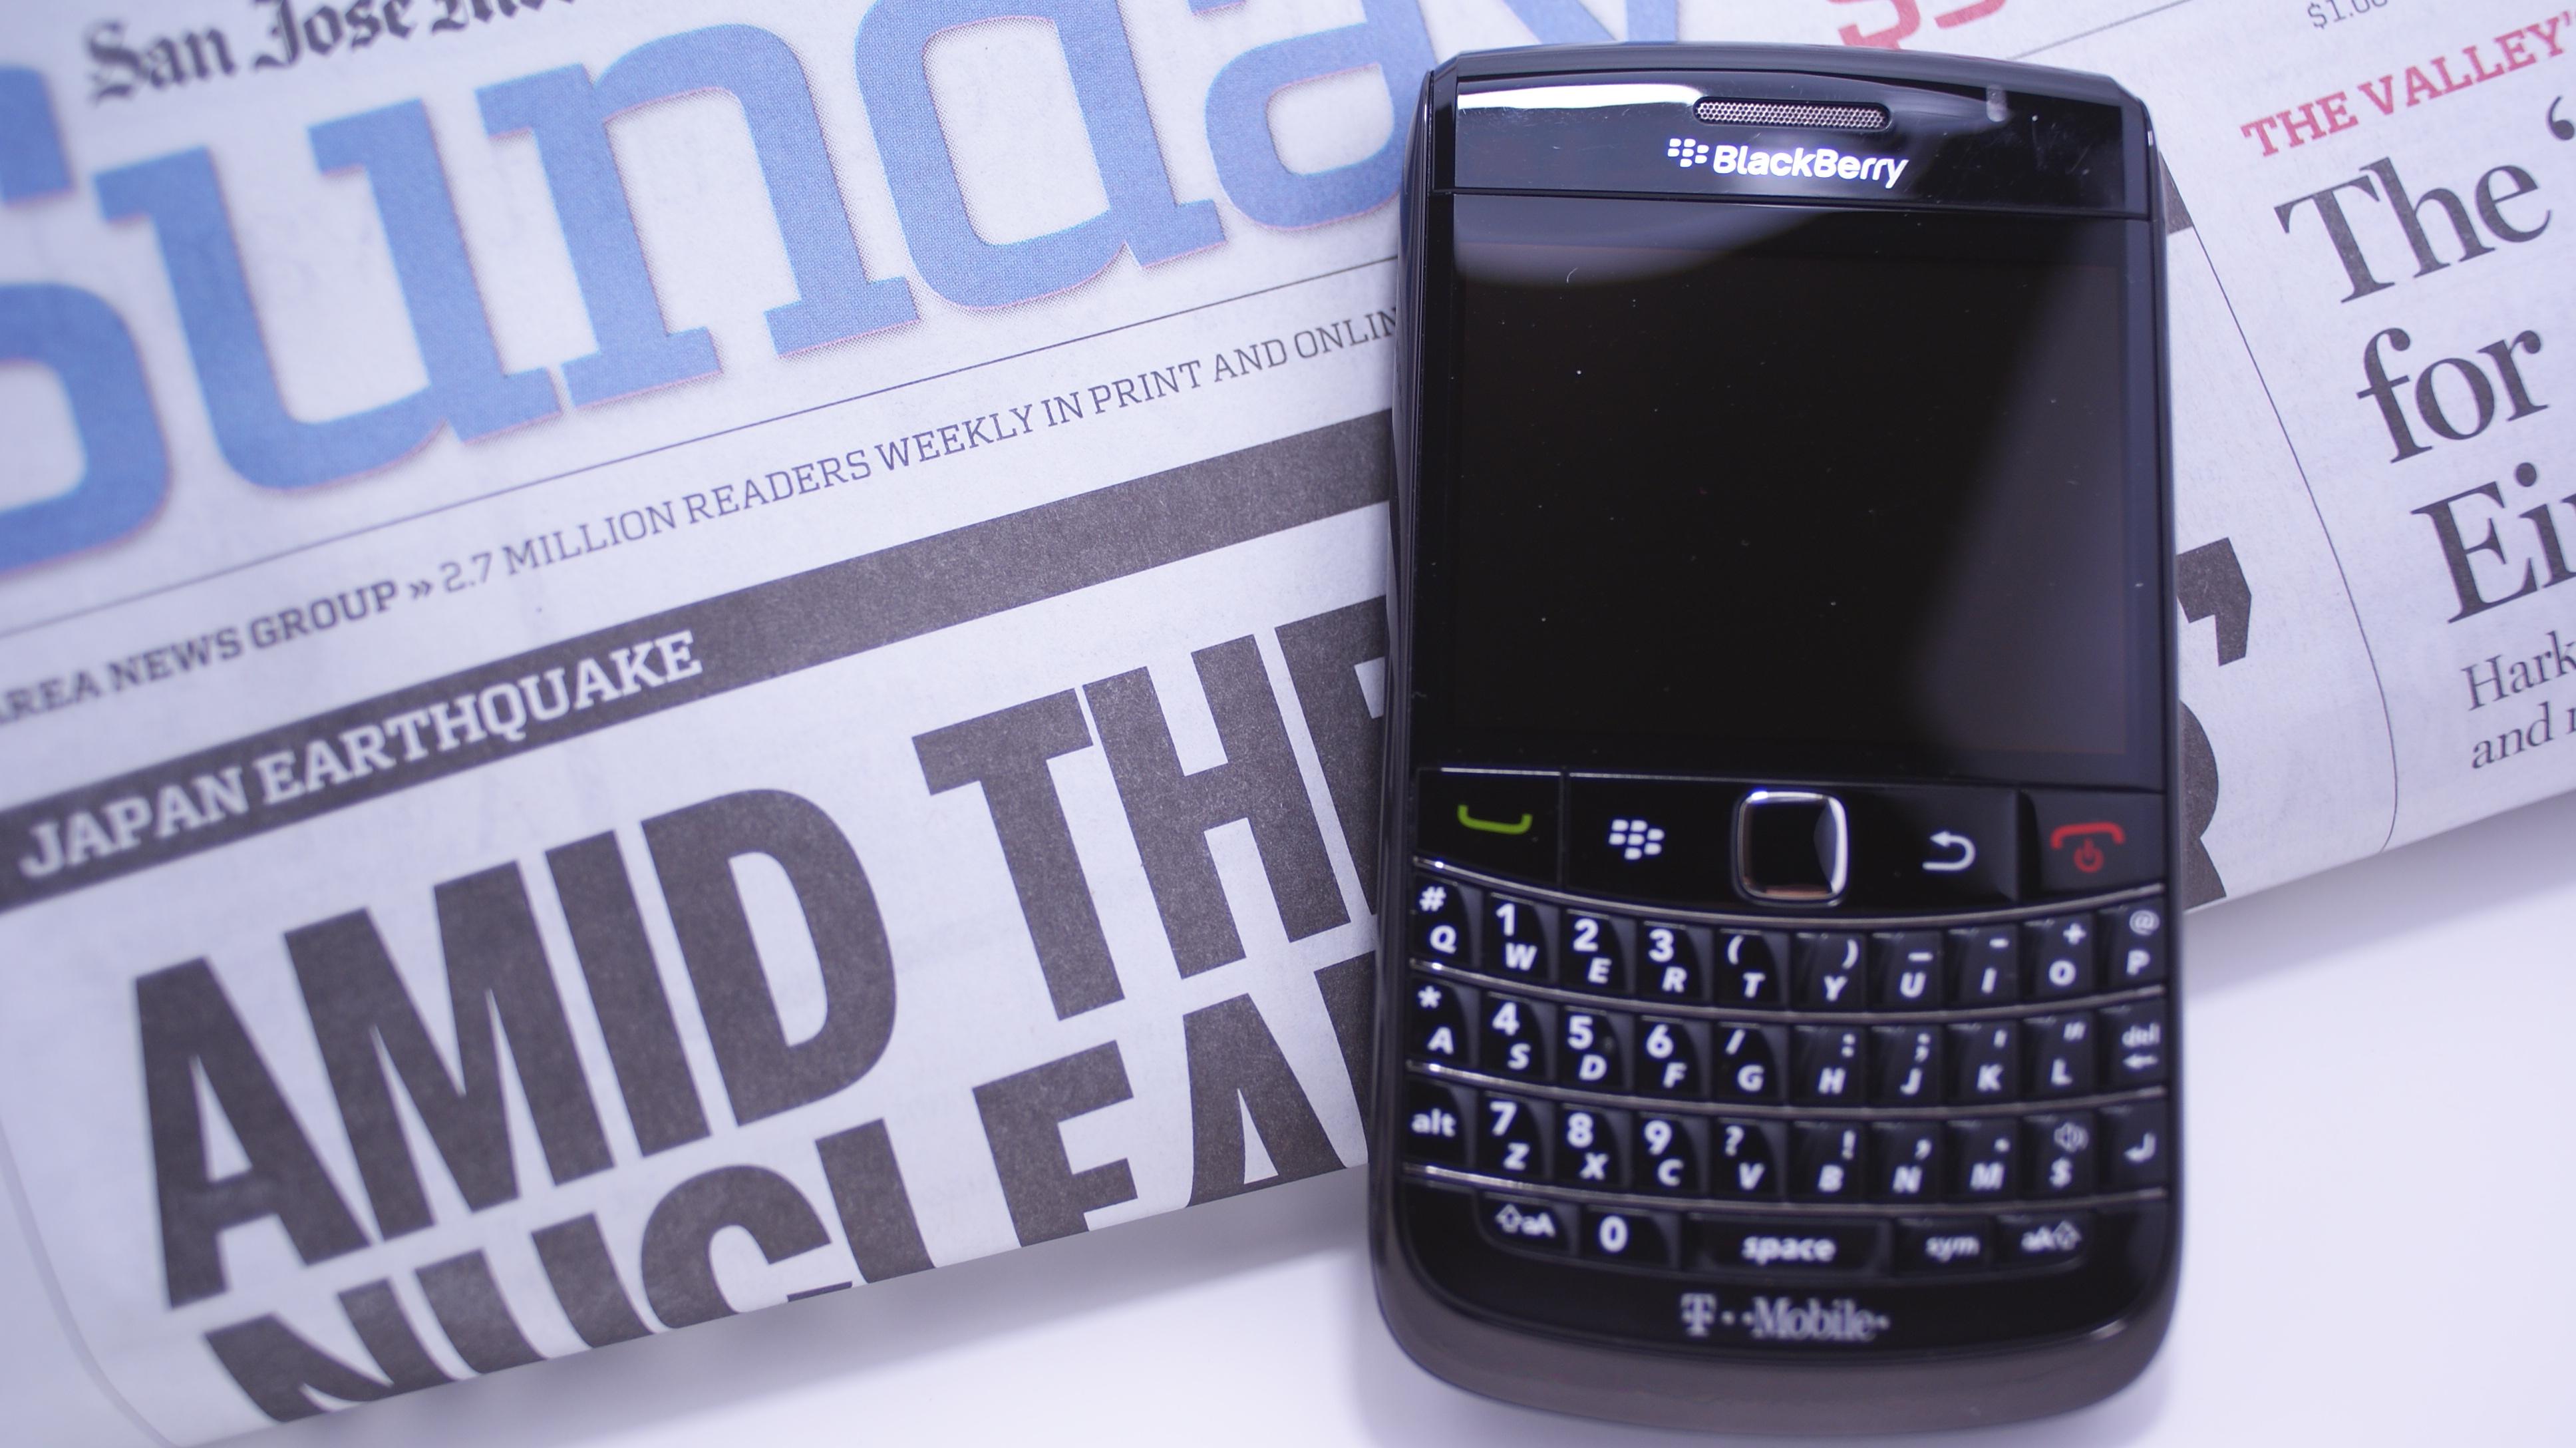 BlackBerry Bold 9780: Not So Bold